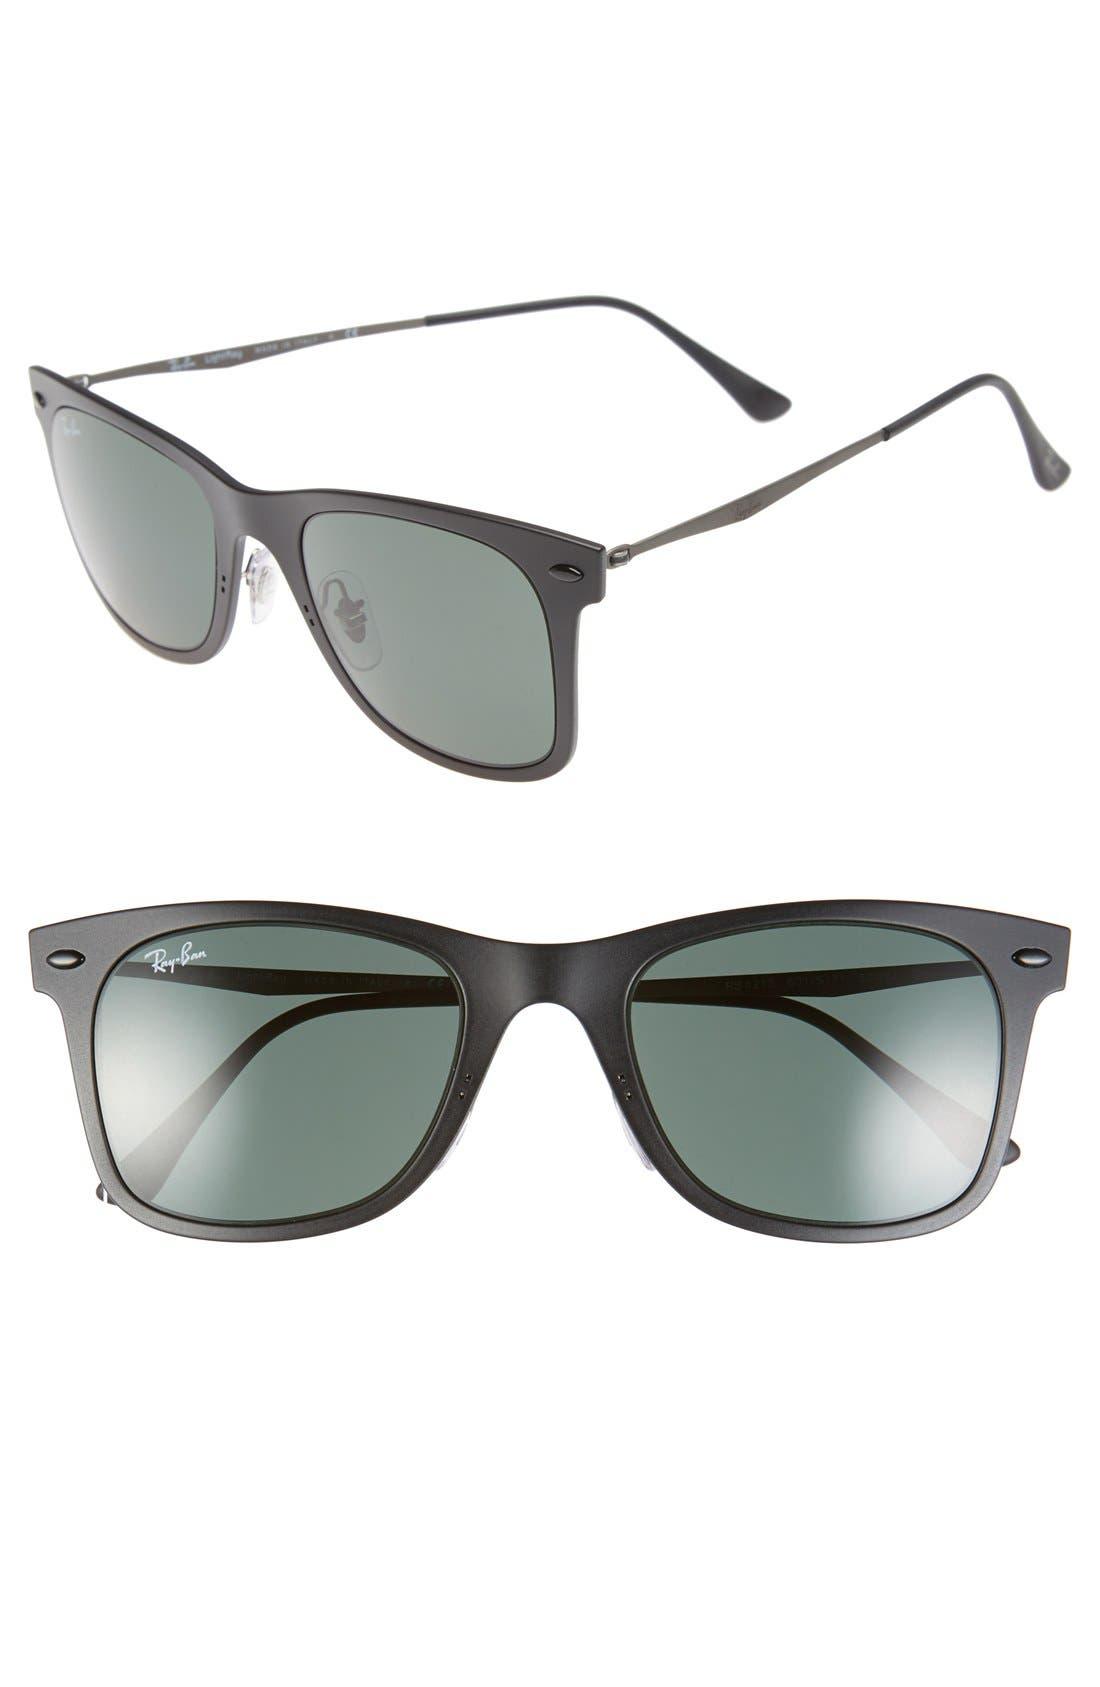 Main Image - Ray-Ban 'TECH Light-Ray' 50mm Wayfarer Sunglasses